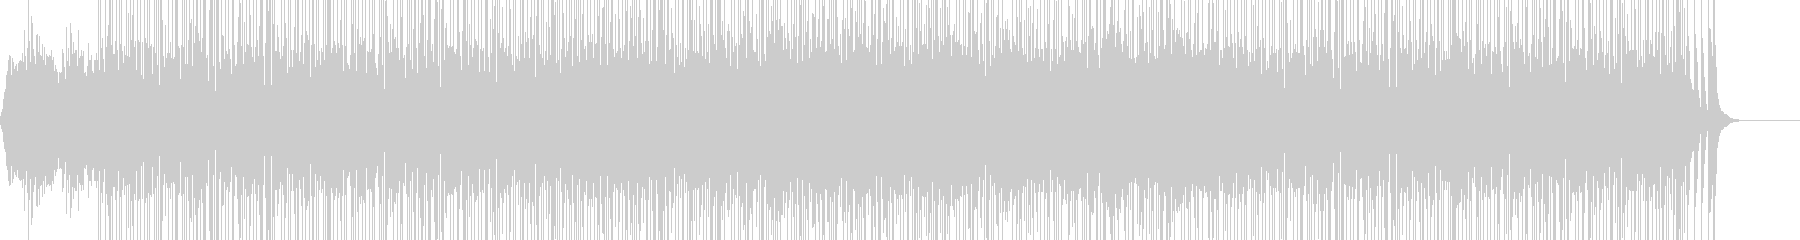 Nu-FUNKの未再生の波形